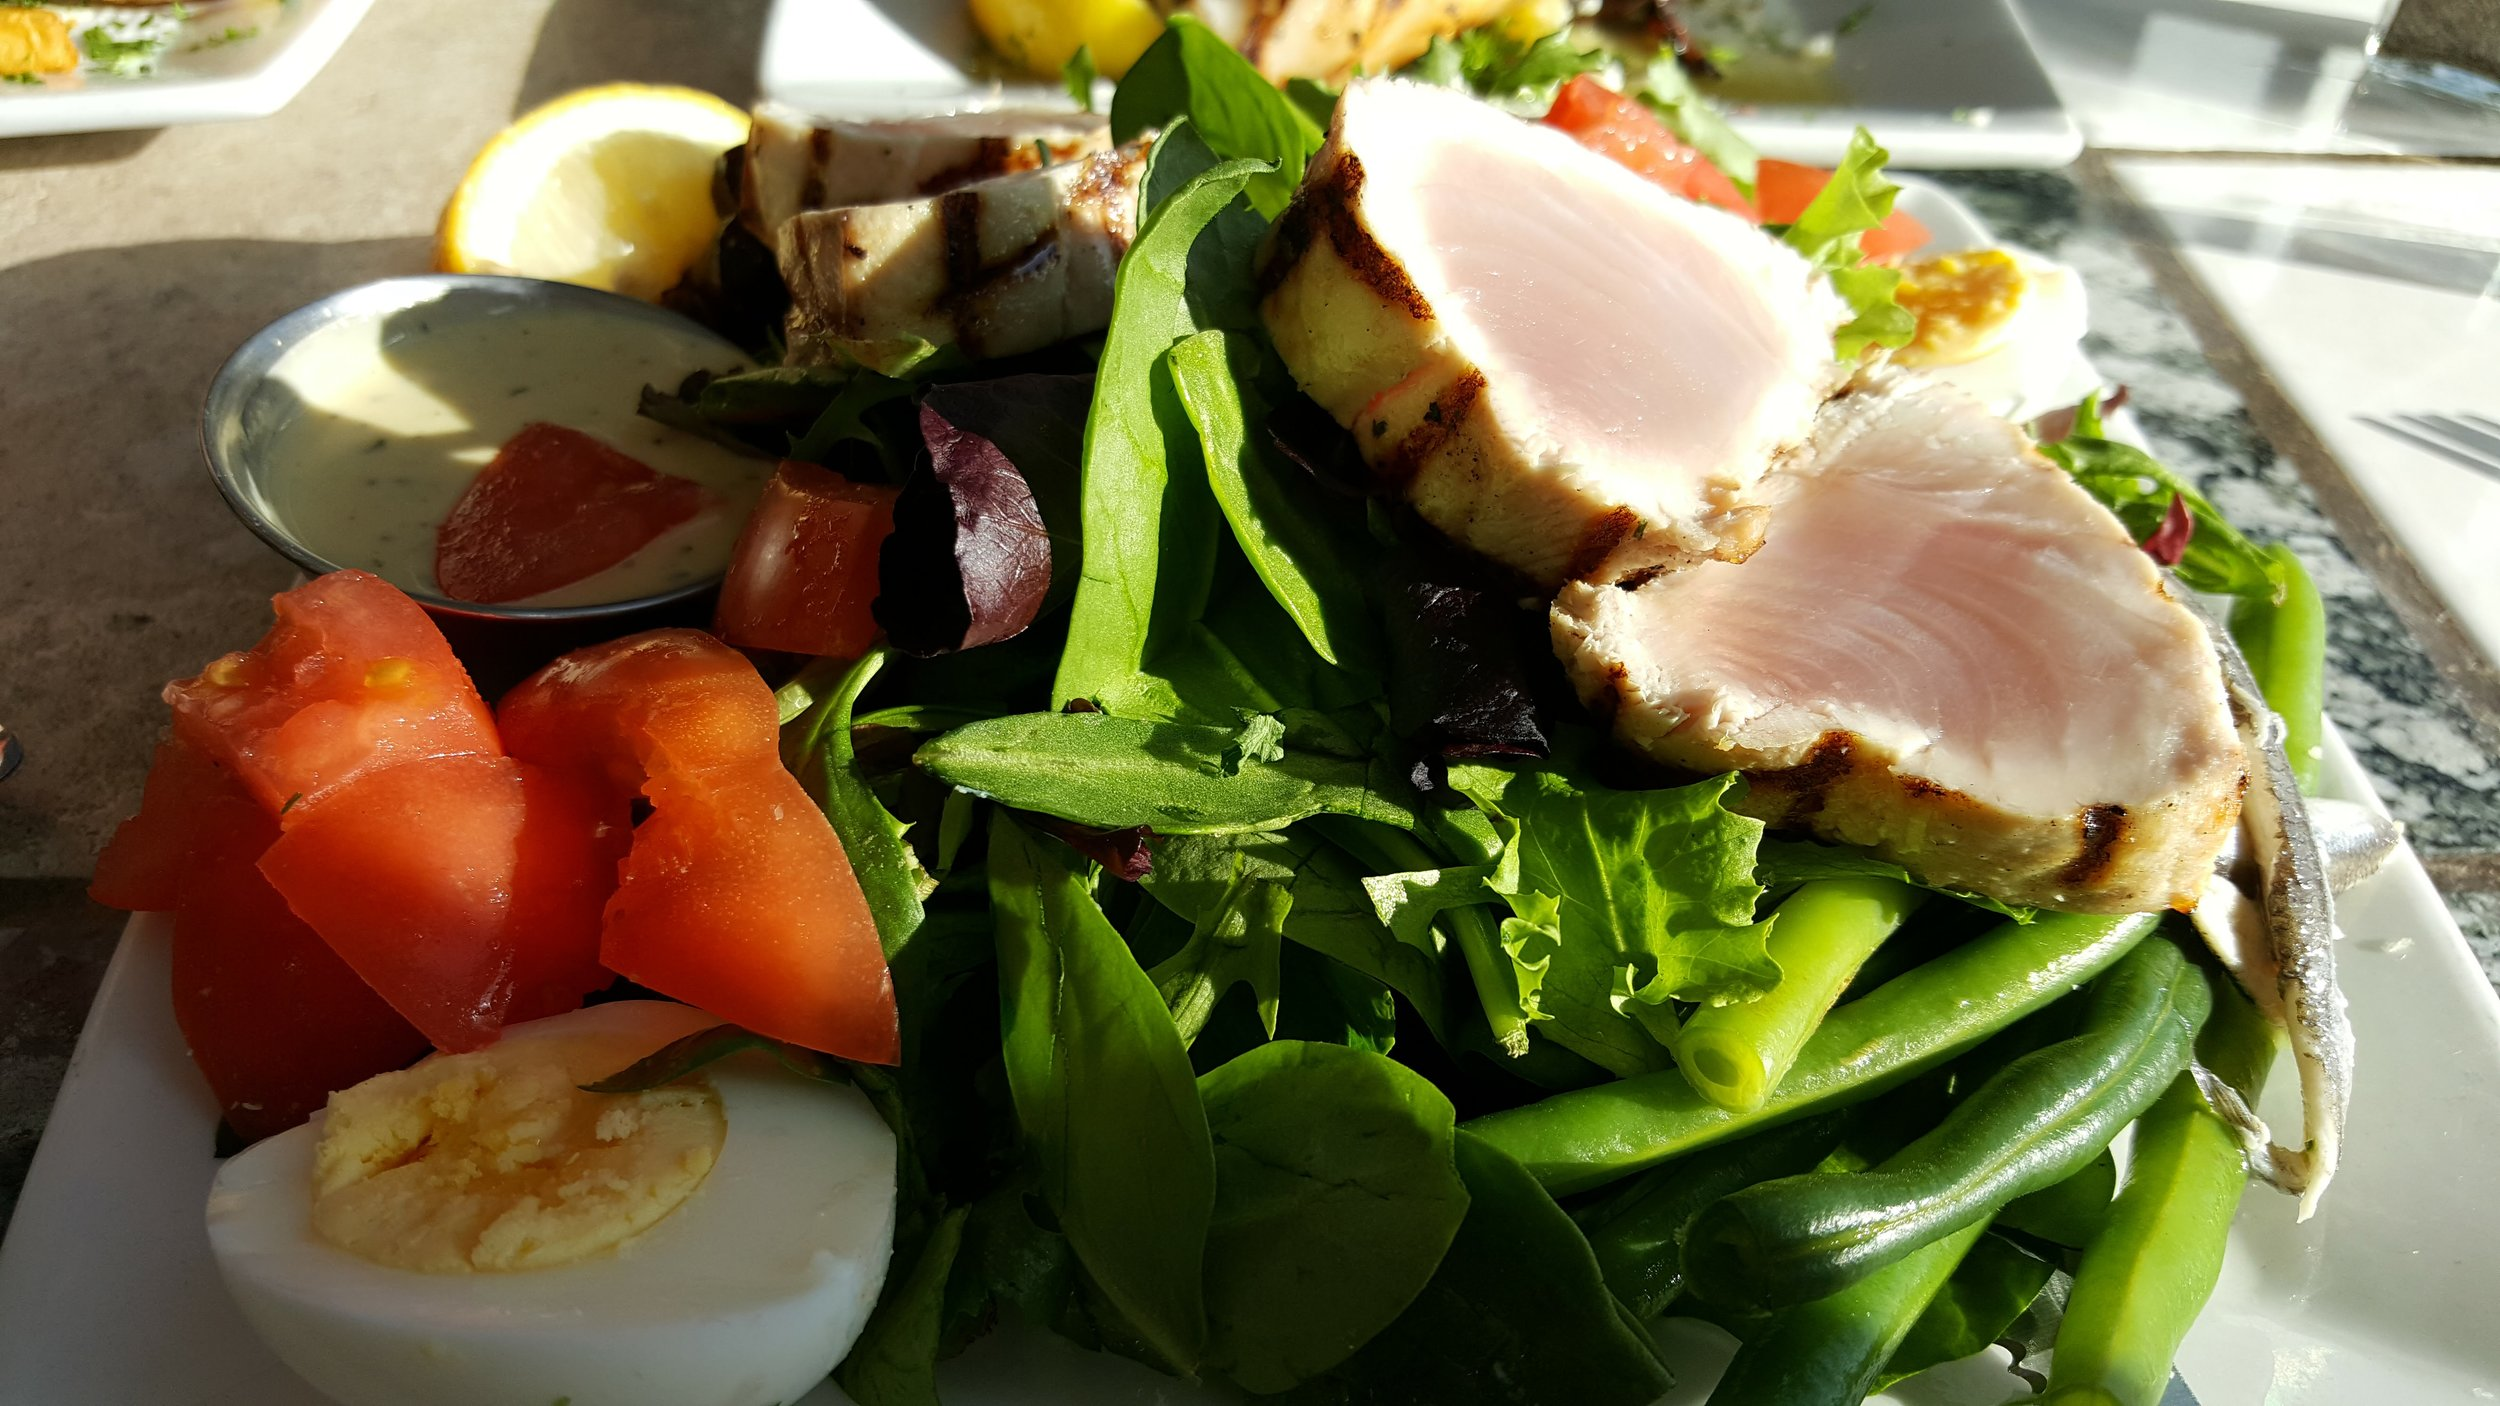 Nicoise salad from my favorite restaurant